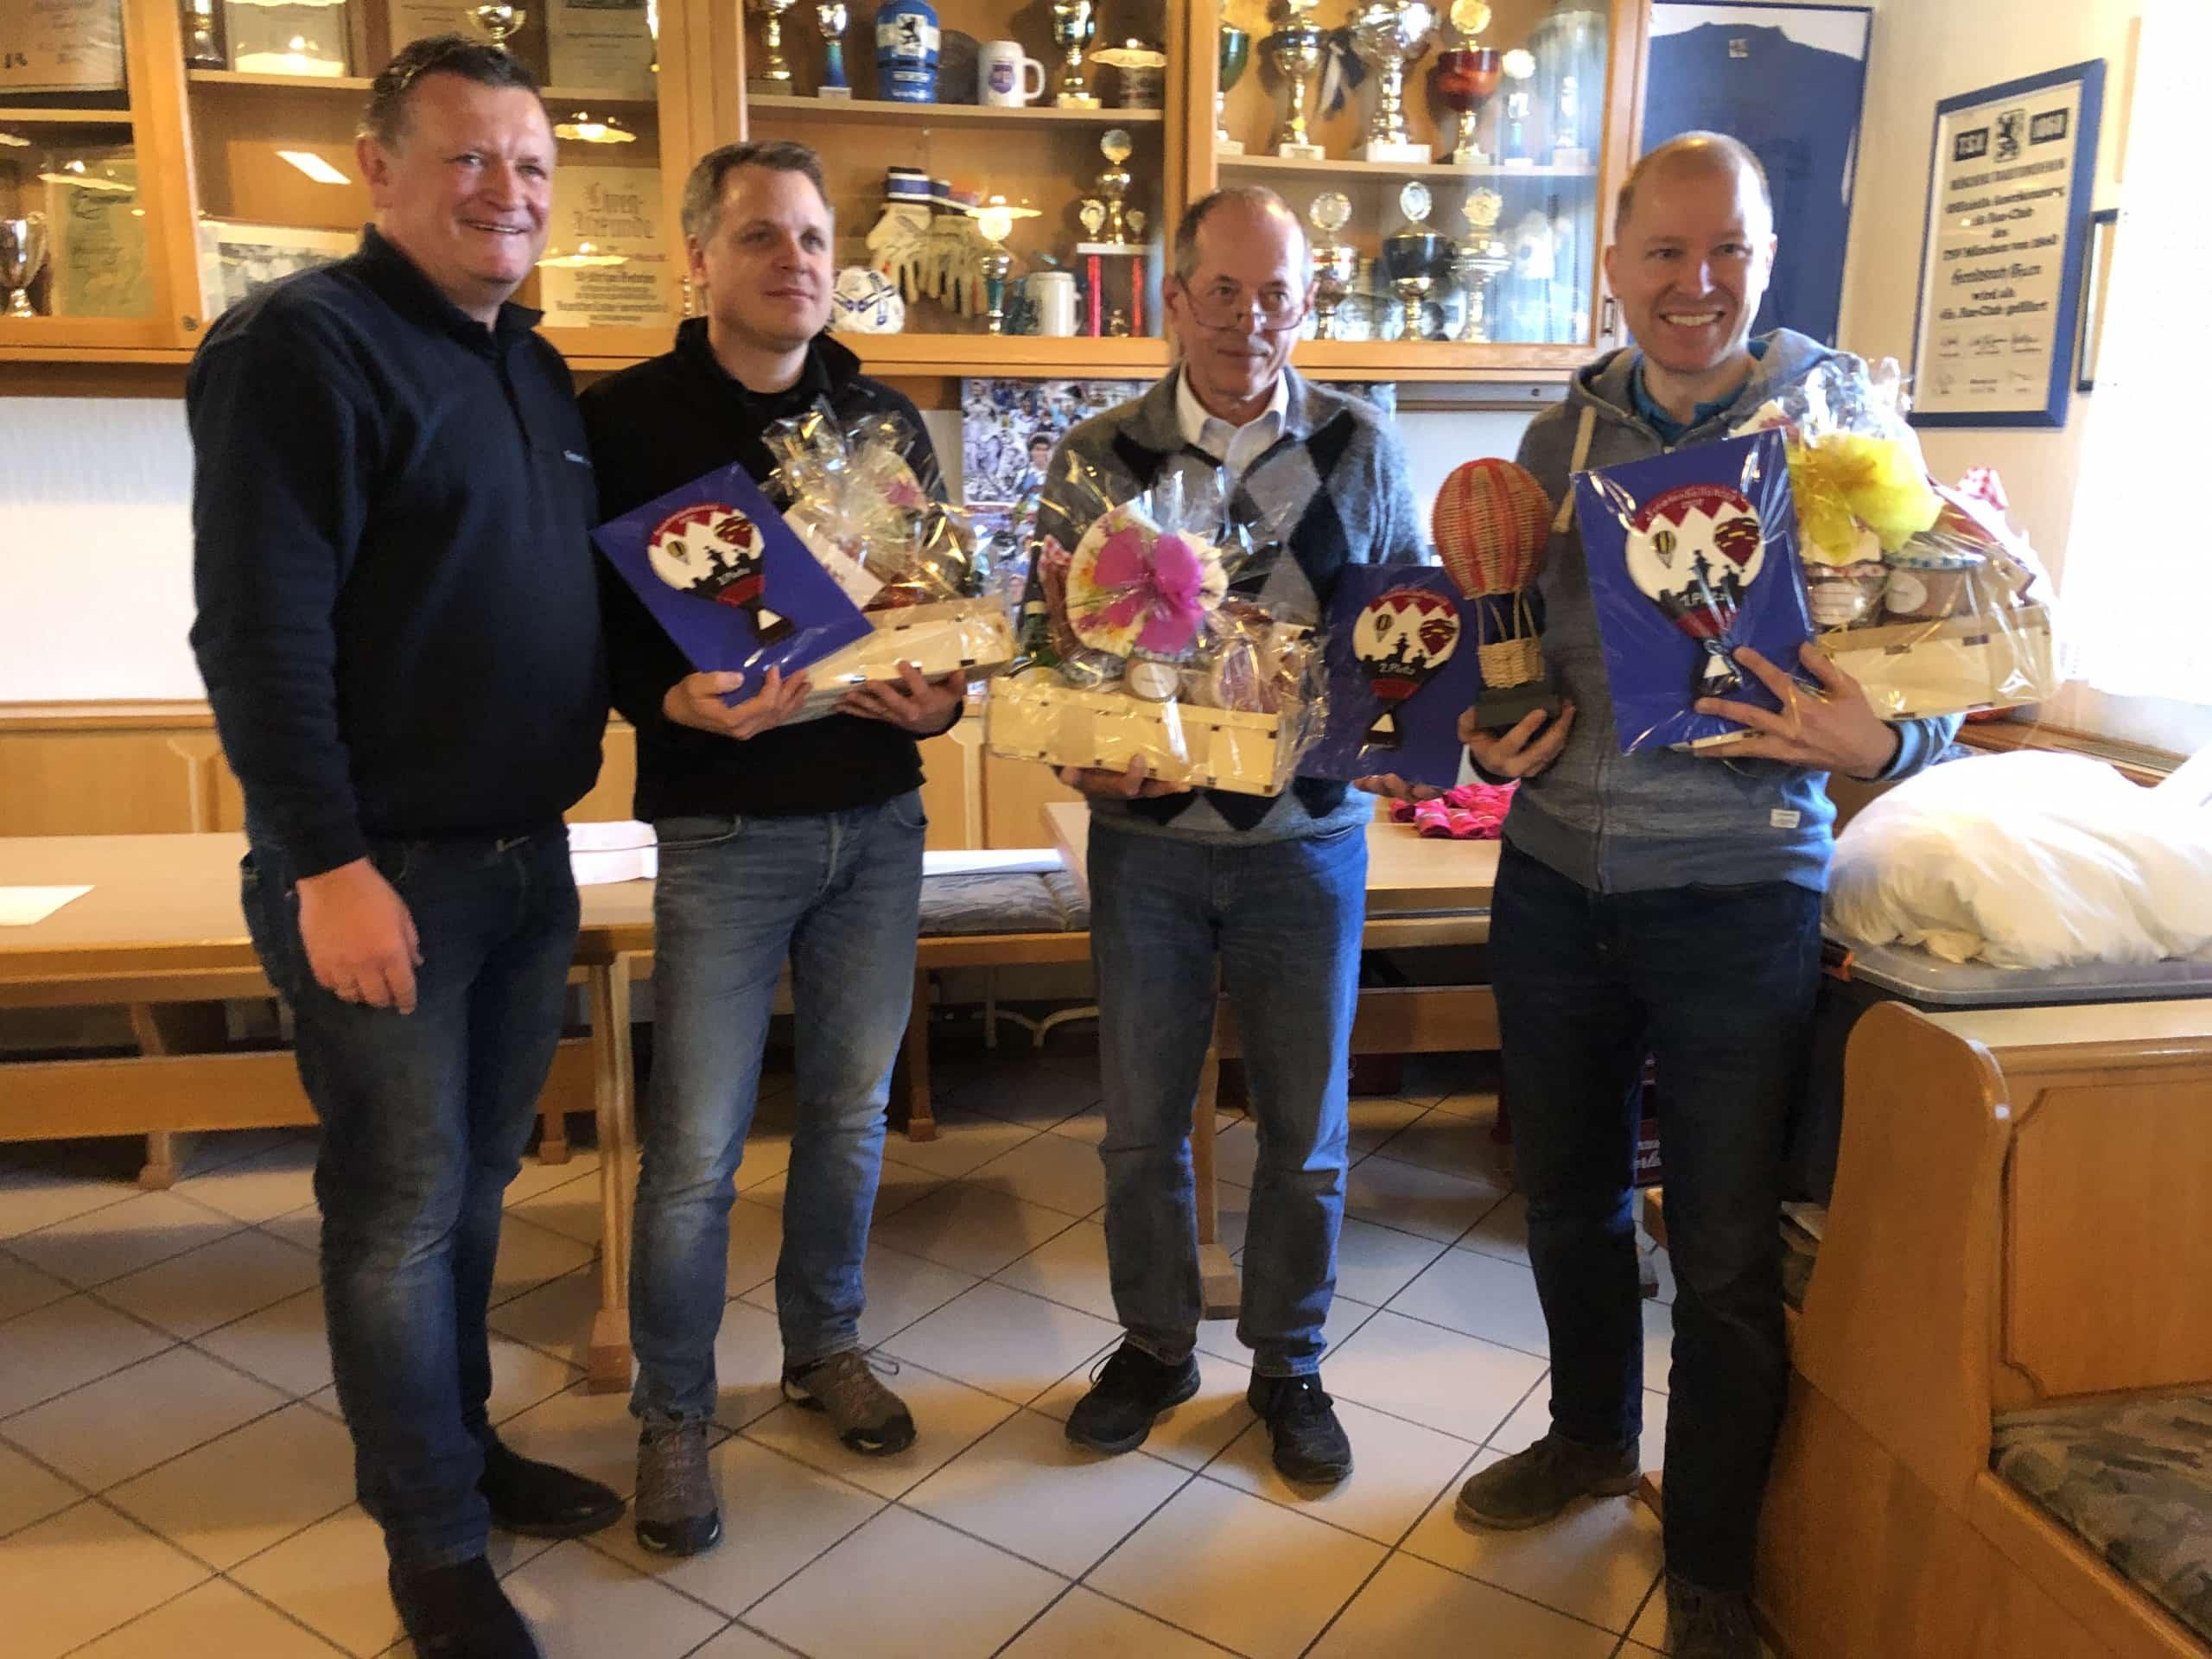 Die Gewinner des Frankenballoncup 2020: v.R. Martin Wegner (1. Platz), i.V. Gerold Kräck (2. Platz: Katharina Kräck), Mirko Fridrici (3. Platz), Manfred Eckstein (Präsident, Veranstaltungsleiter)